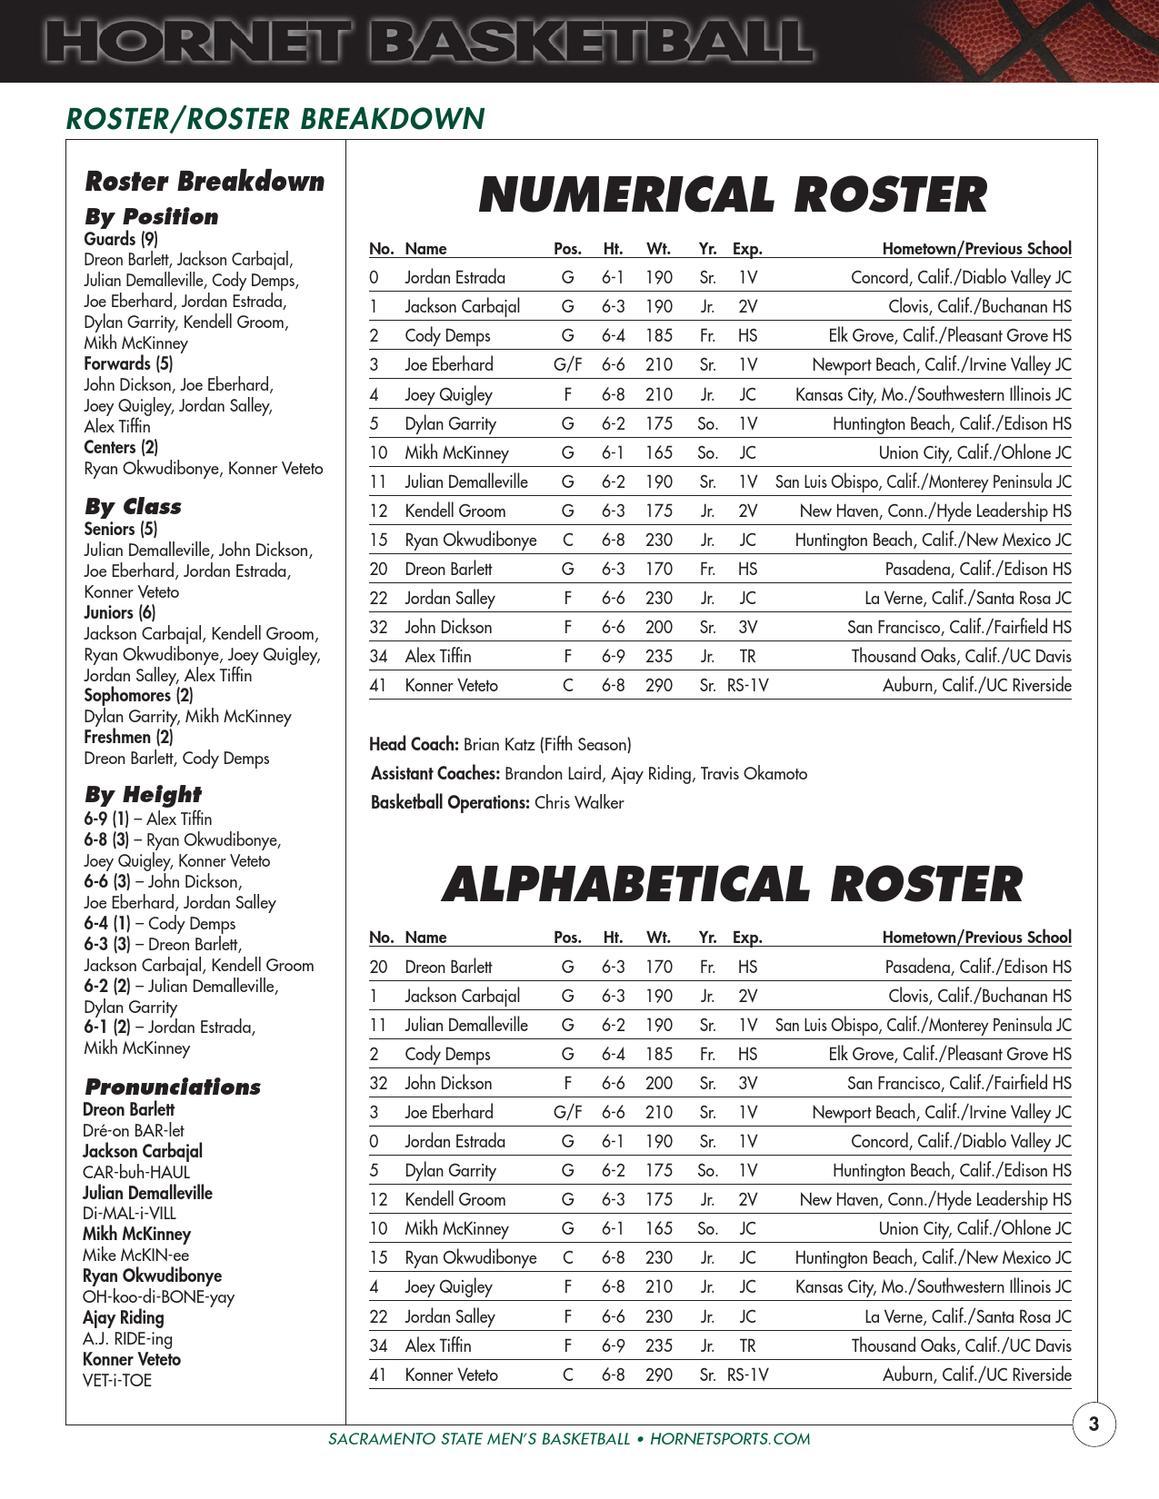 2012-13 Sacramento State men's basketball media guide by